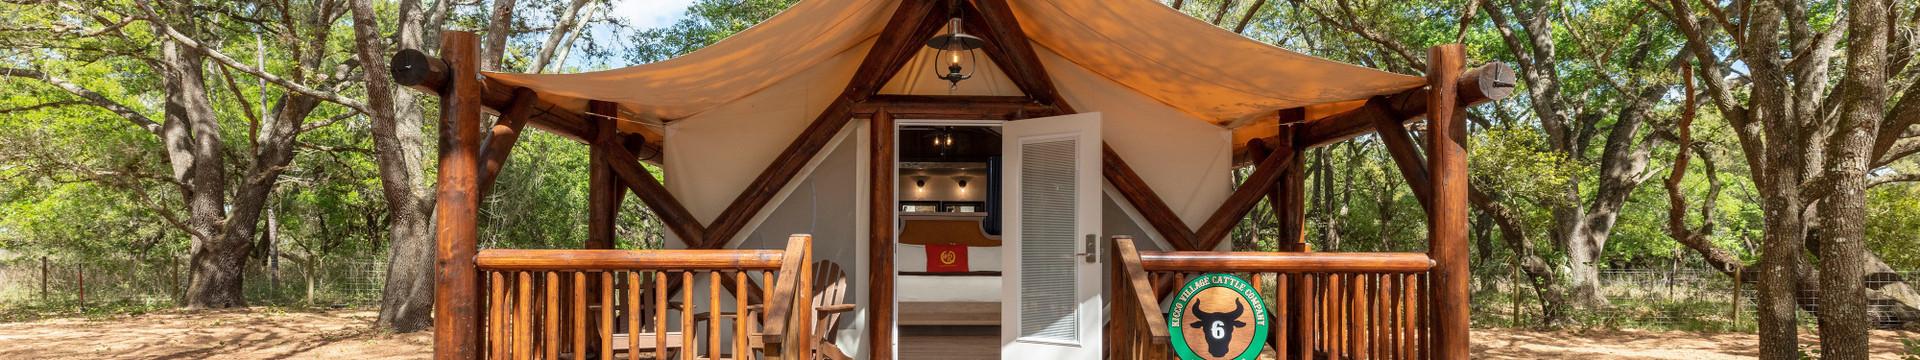 Luxury Glamping | Westgate River Ranch Resort